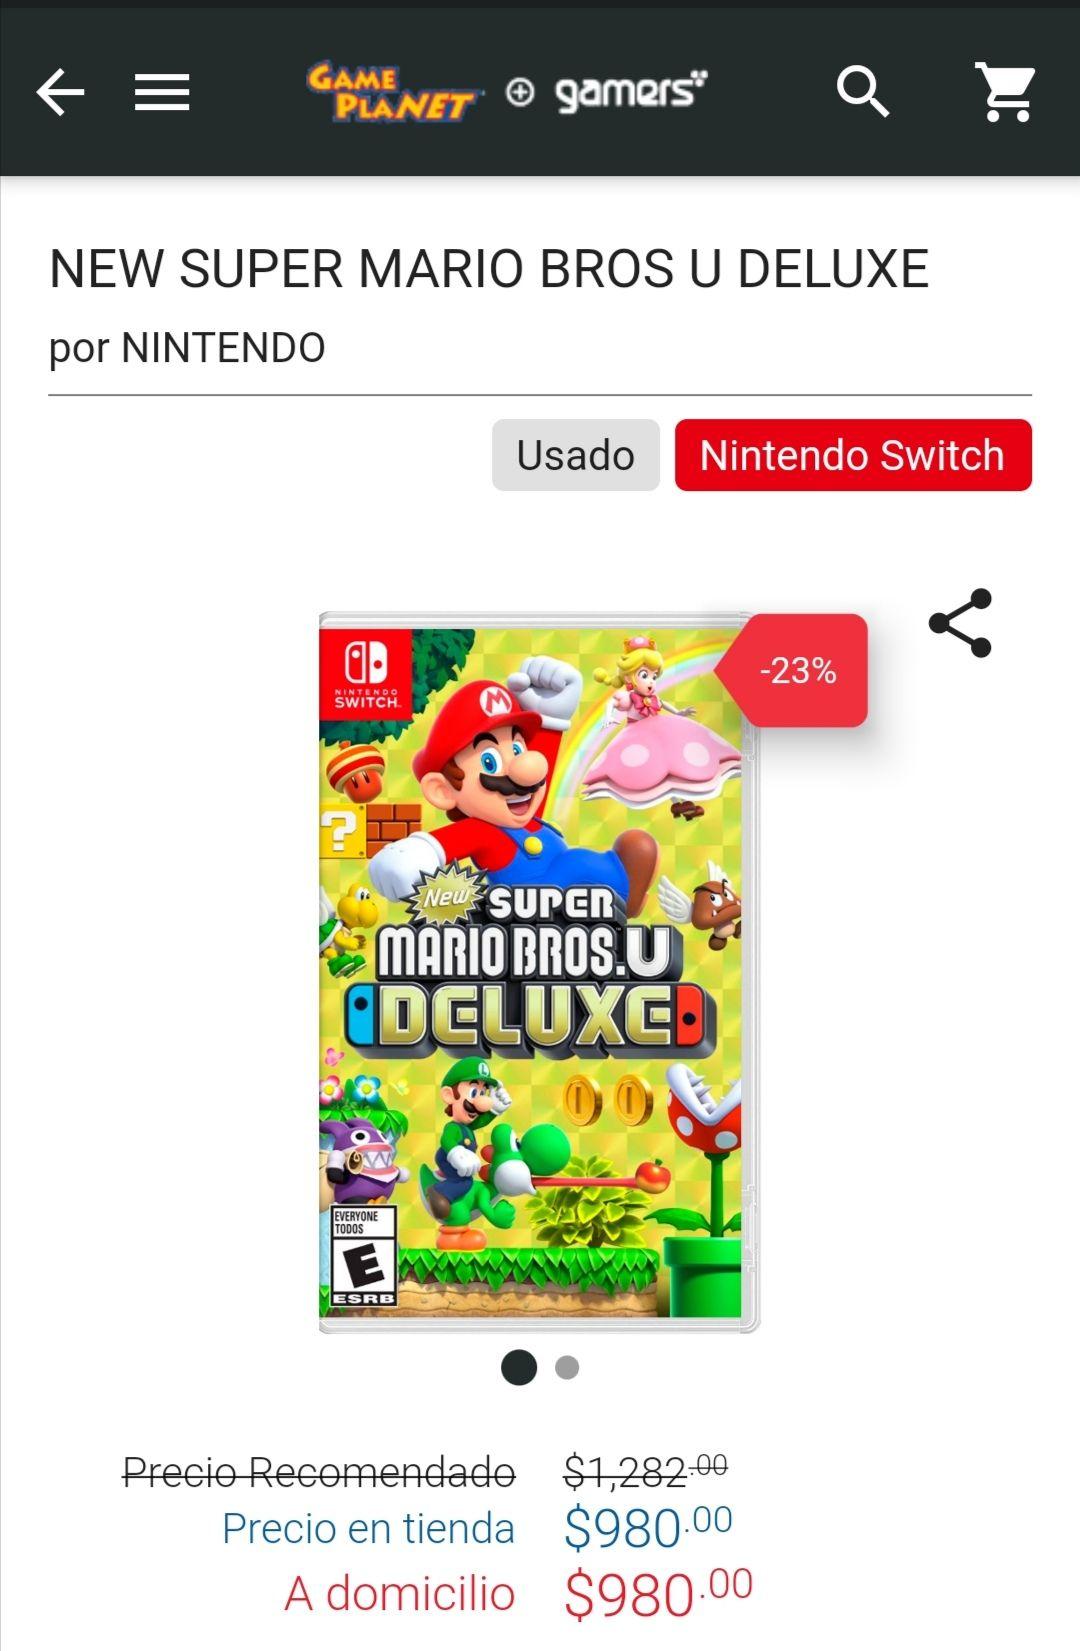 Game Planet: NEW SUPER MARIO BROS U DELUXE para Nintendo switch